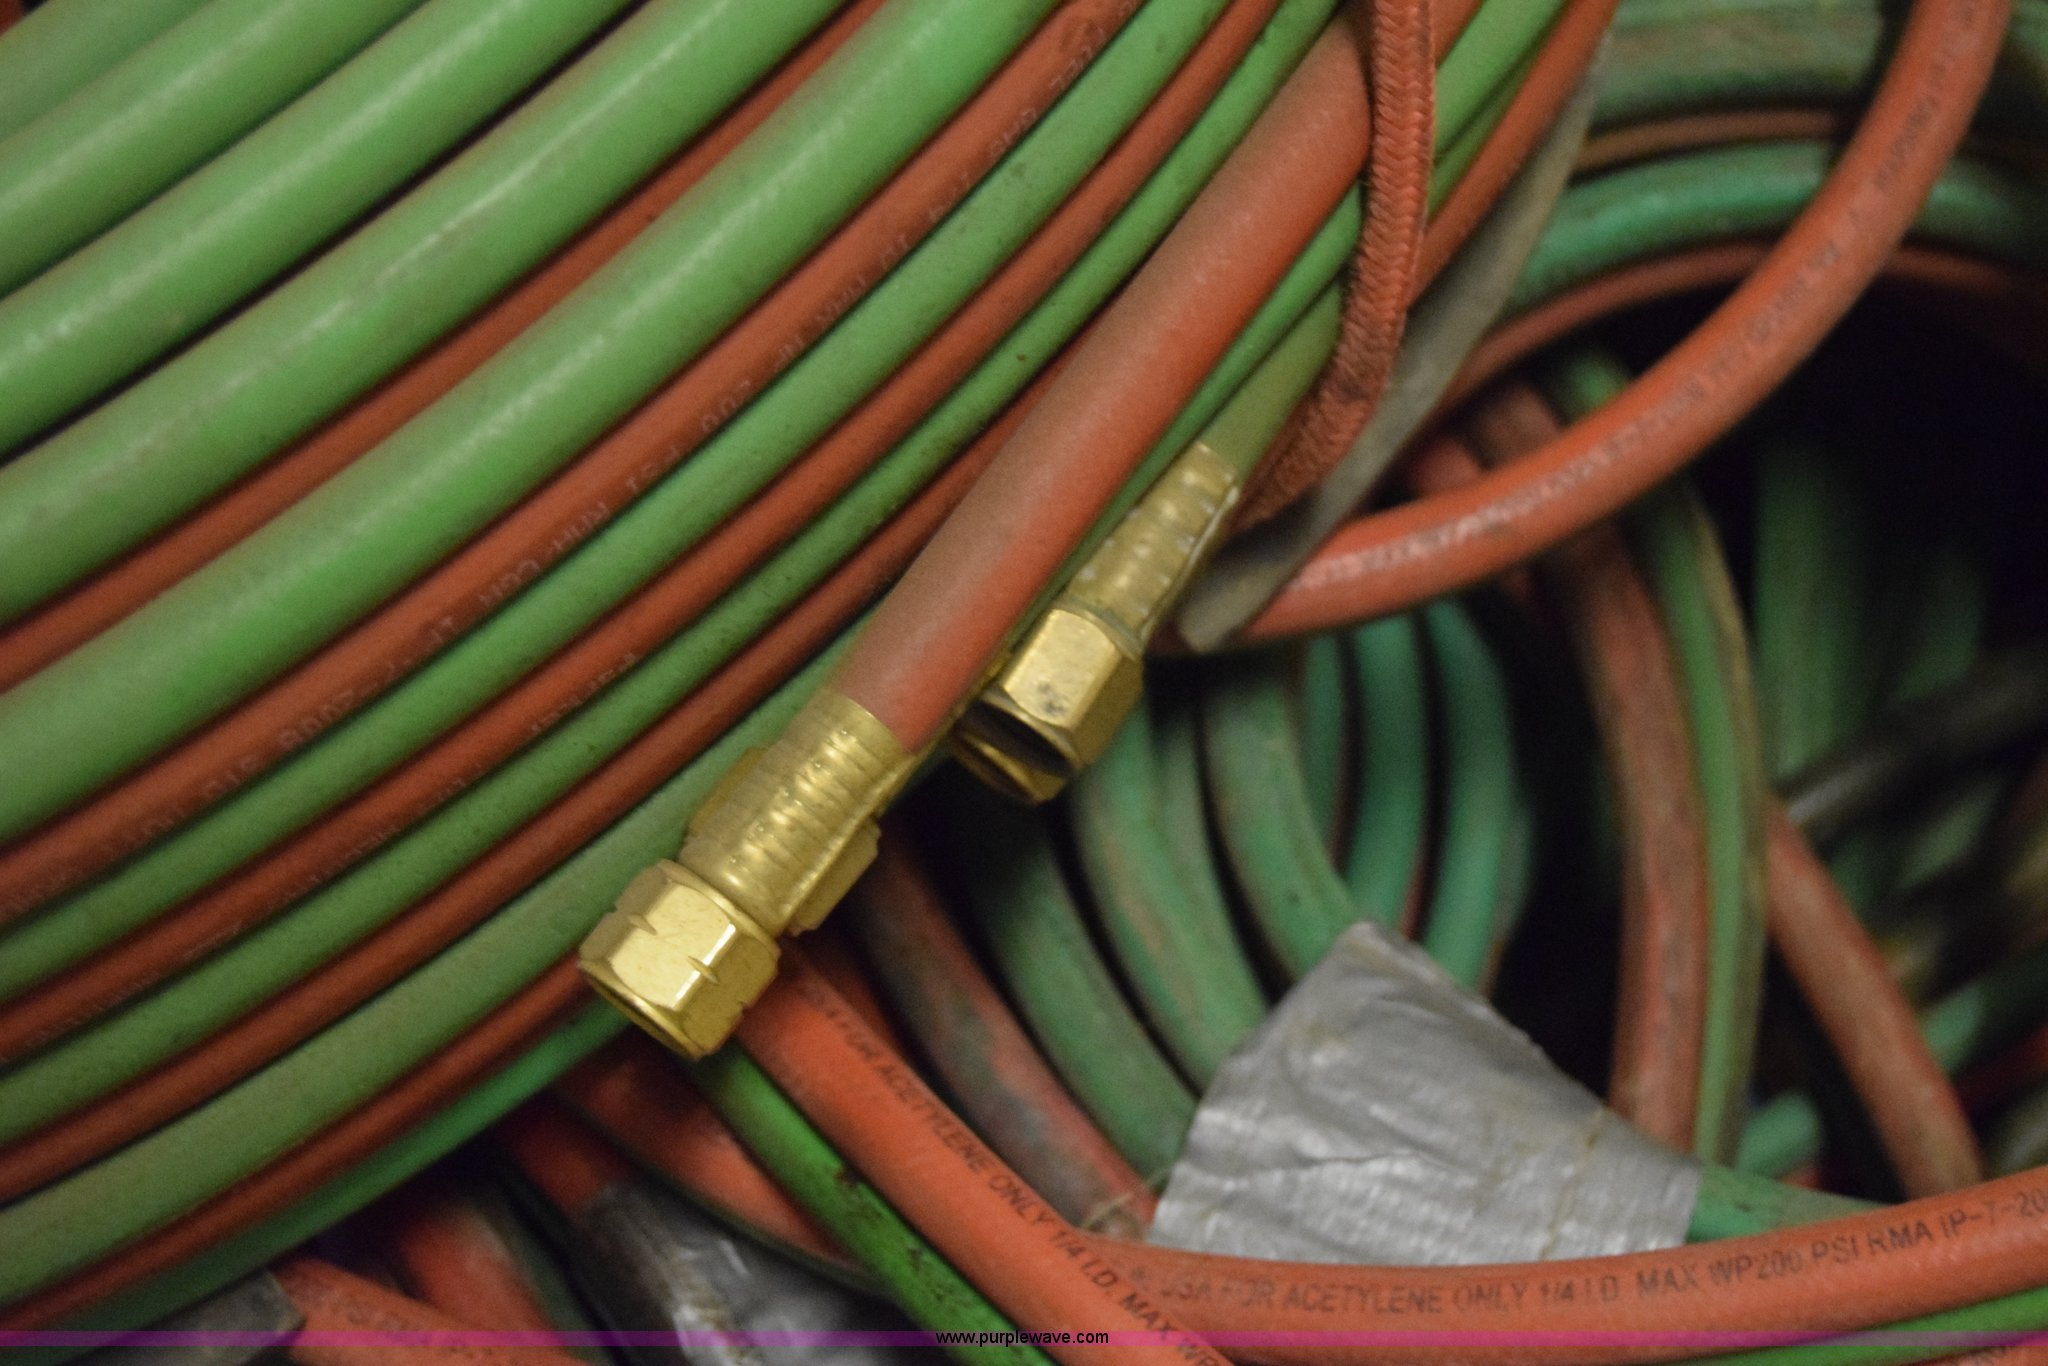 Rigid 300 pipe threader | Item L2692 | SOLD! August 11 RWI W...